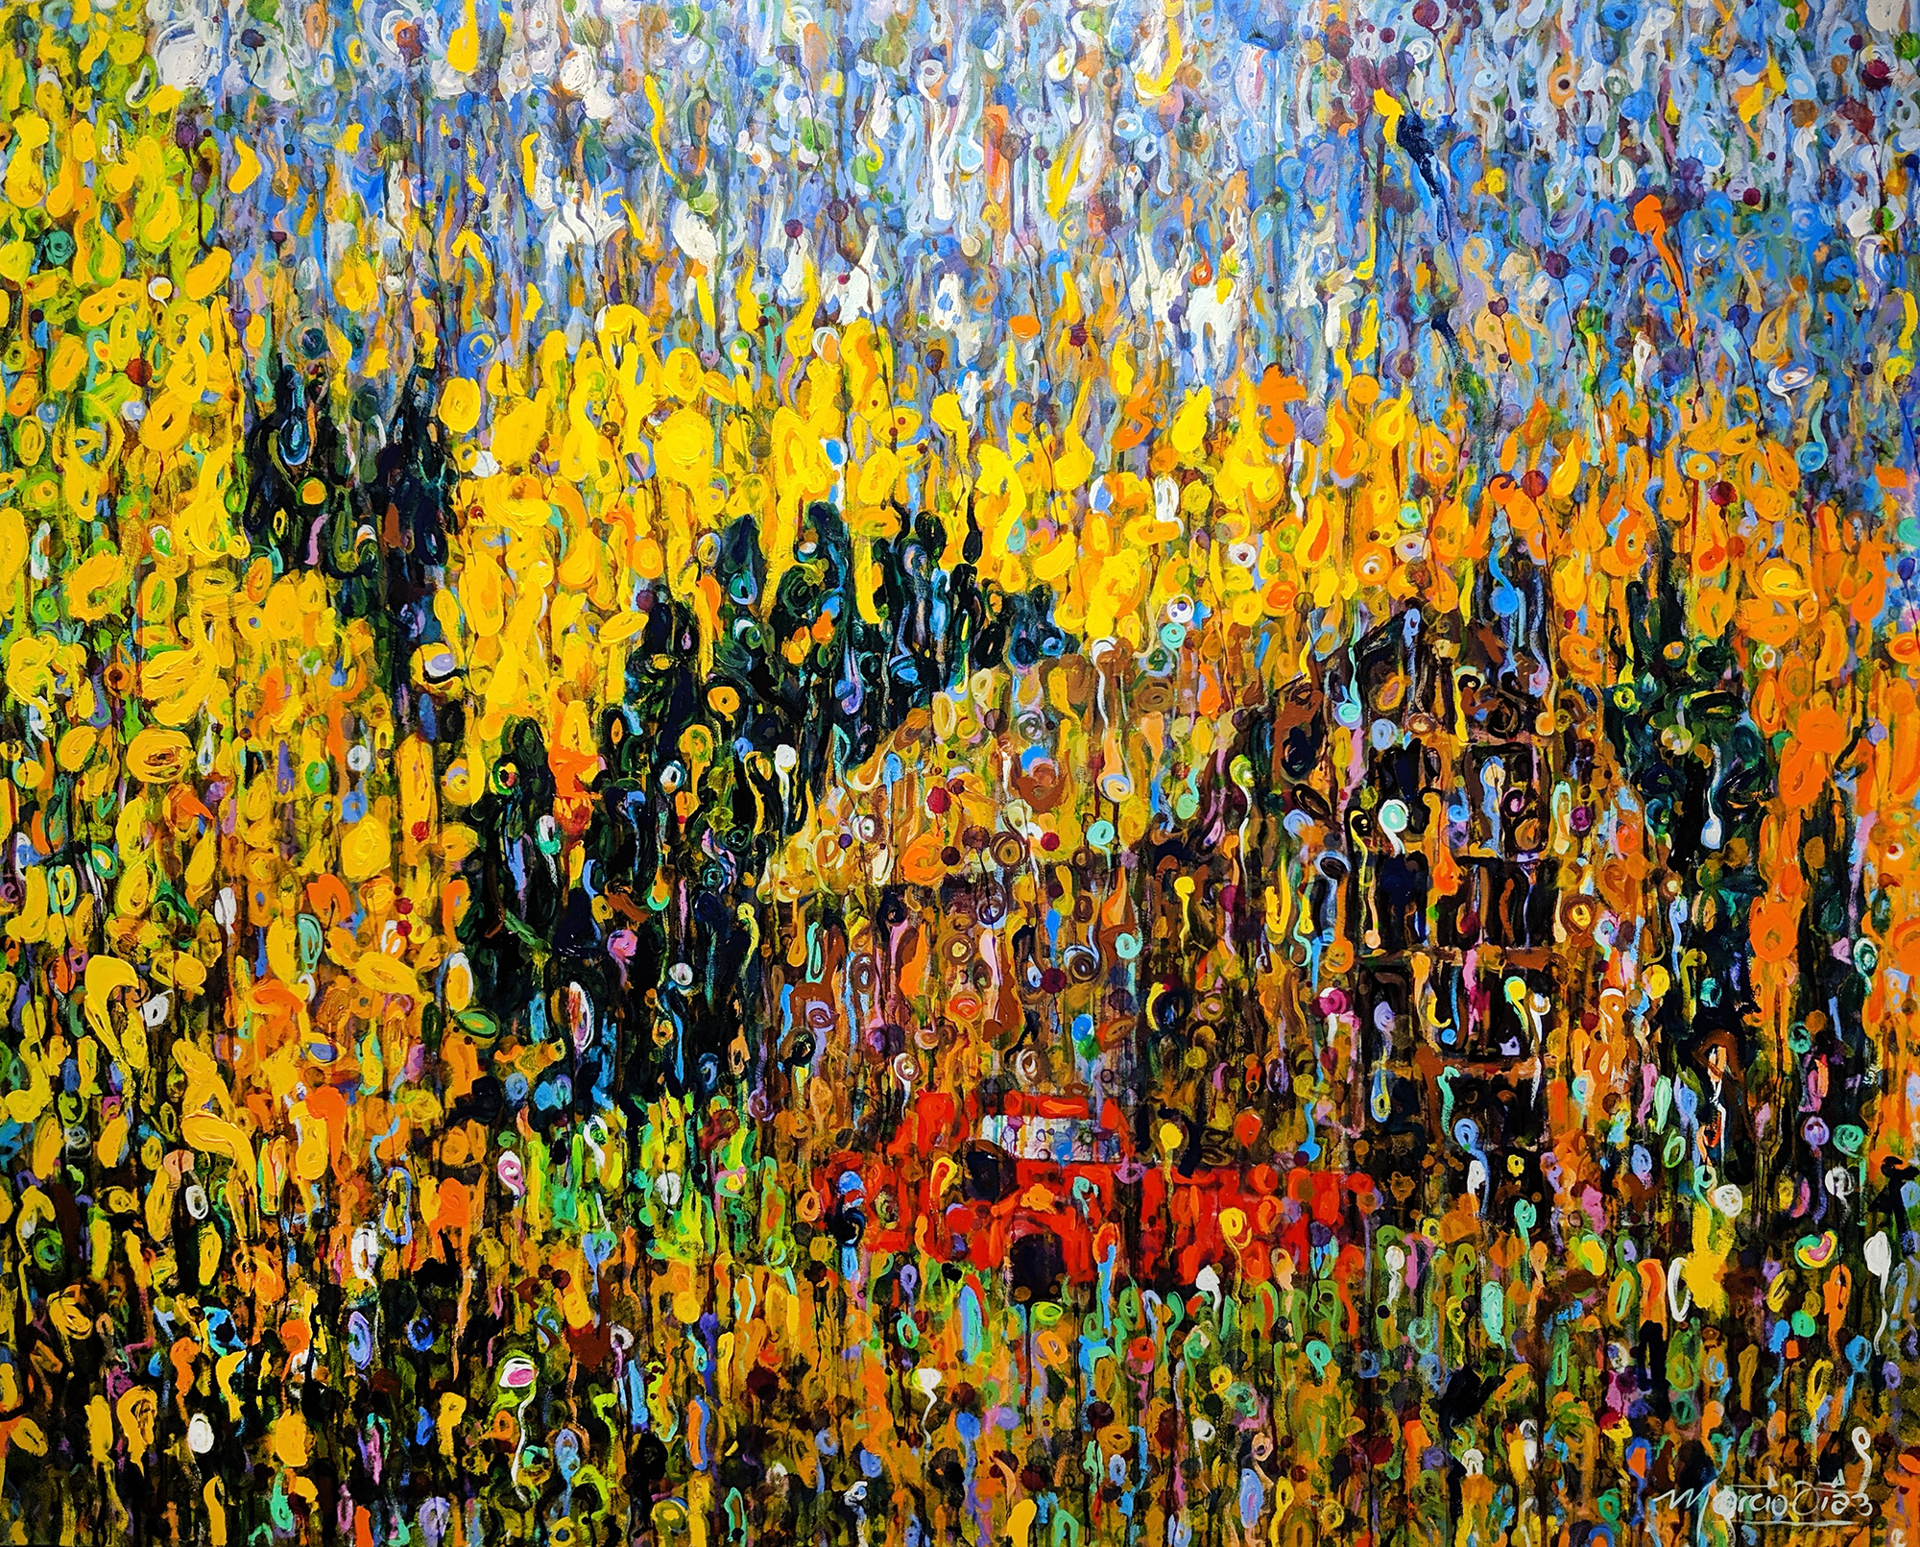 Autumn in the Rockies by Marcio Diaz